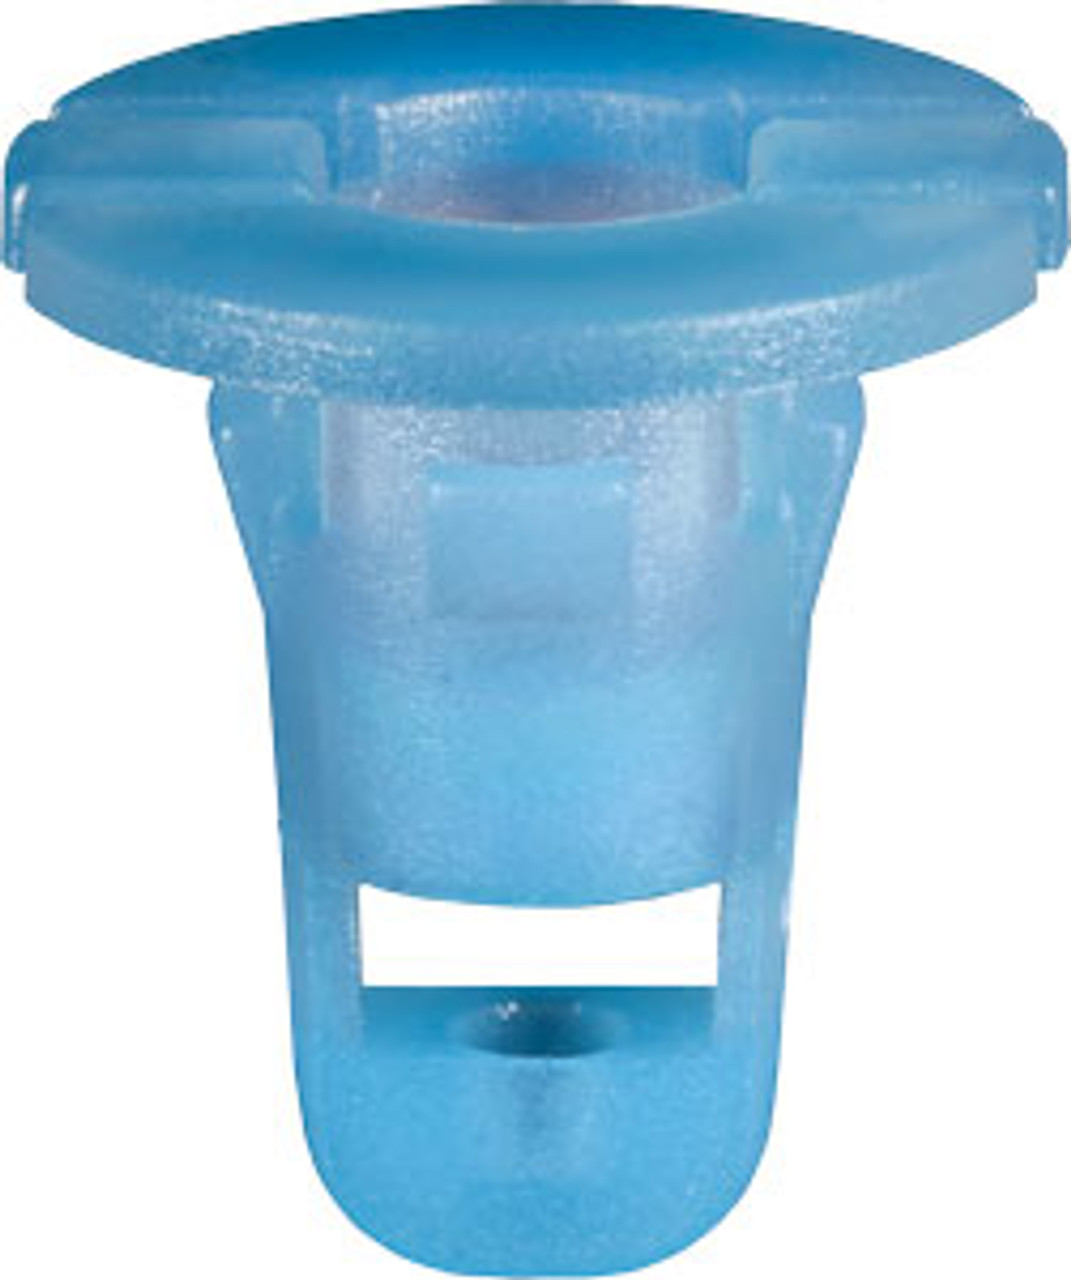 Rocker & Door Trim Panel Grommet Head Diameter: 15mm Stem Diameter: 8mm Light Blue Nylon Stem Length: 15mm Infiniti Q60 Coupe Nissan 350Z & Versa 2014 - 2006 Nissan OEM# 76848-ED000 25 Per Box